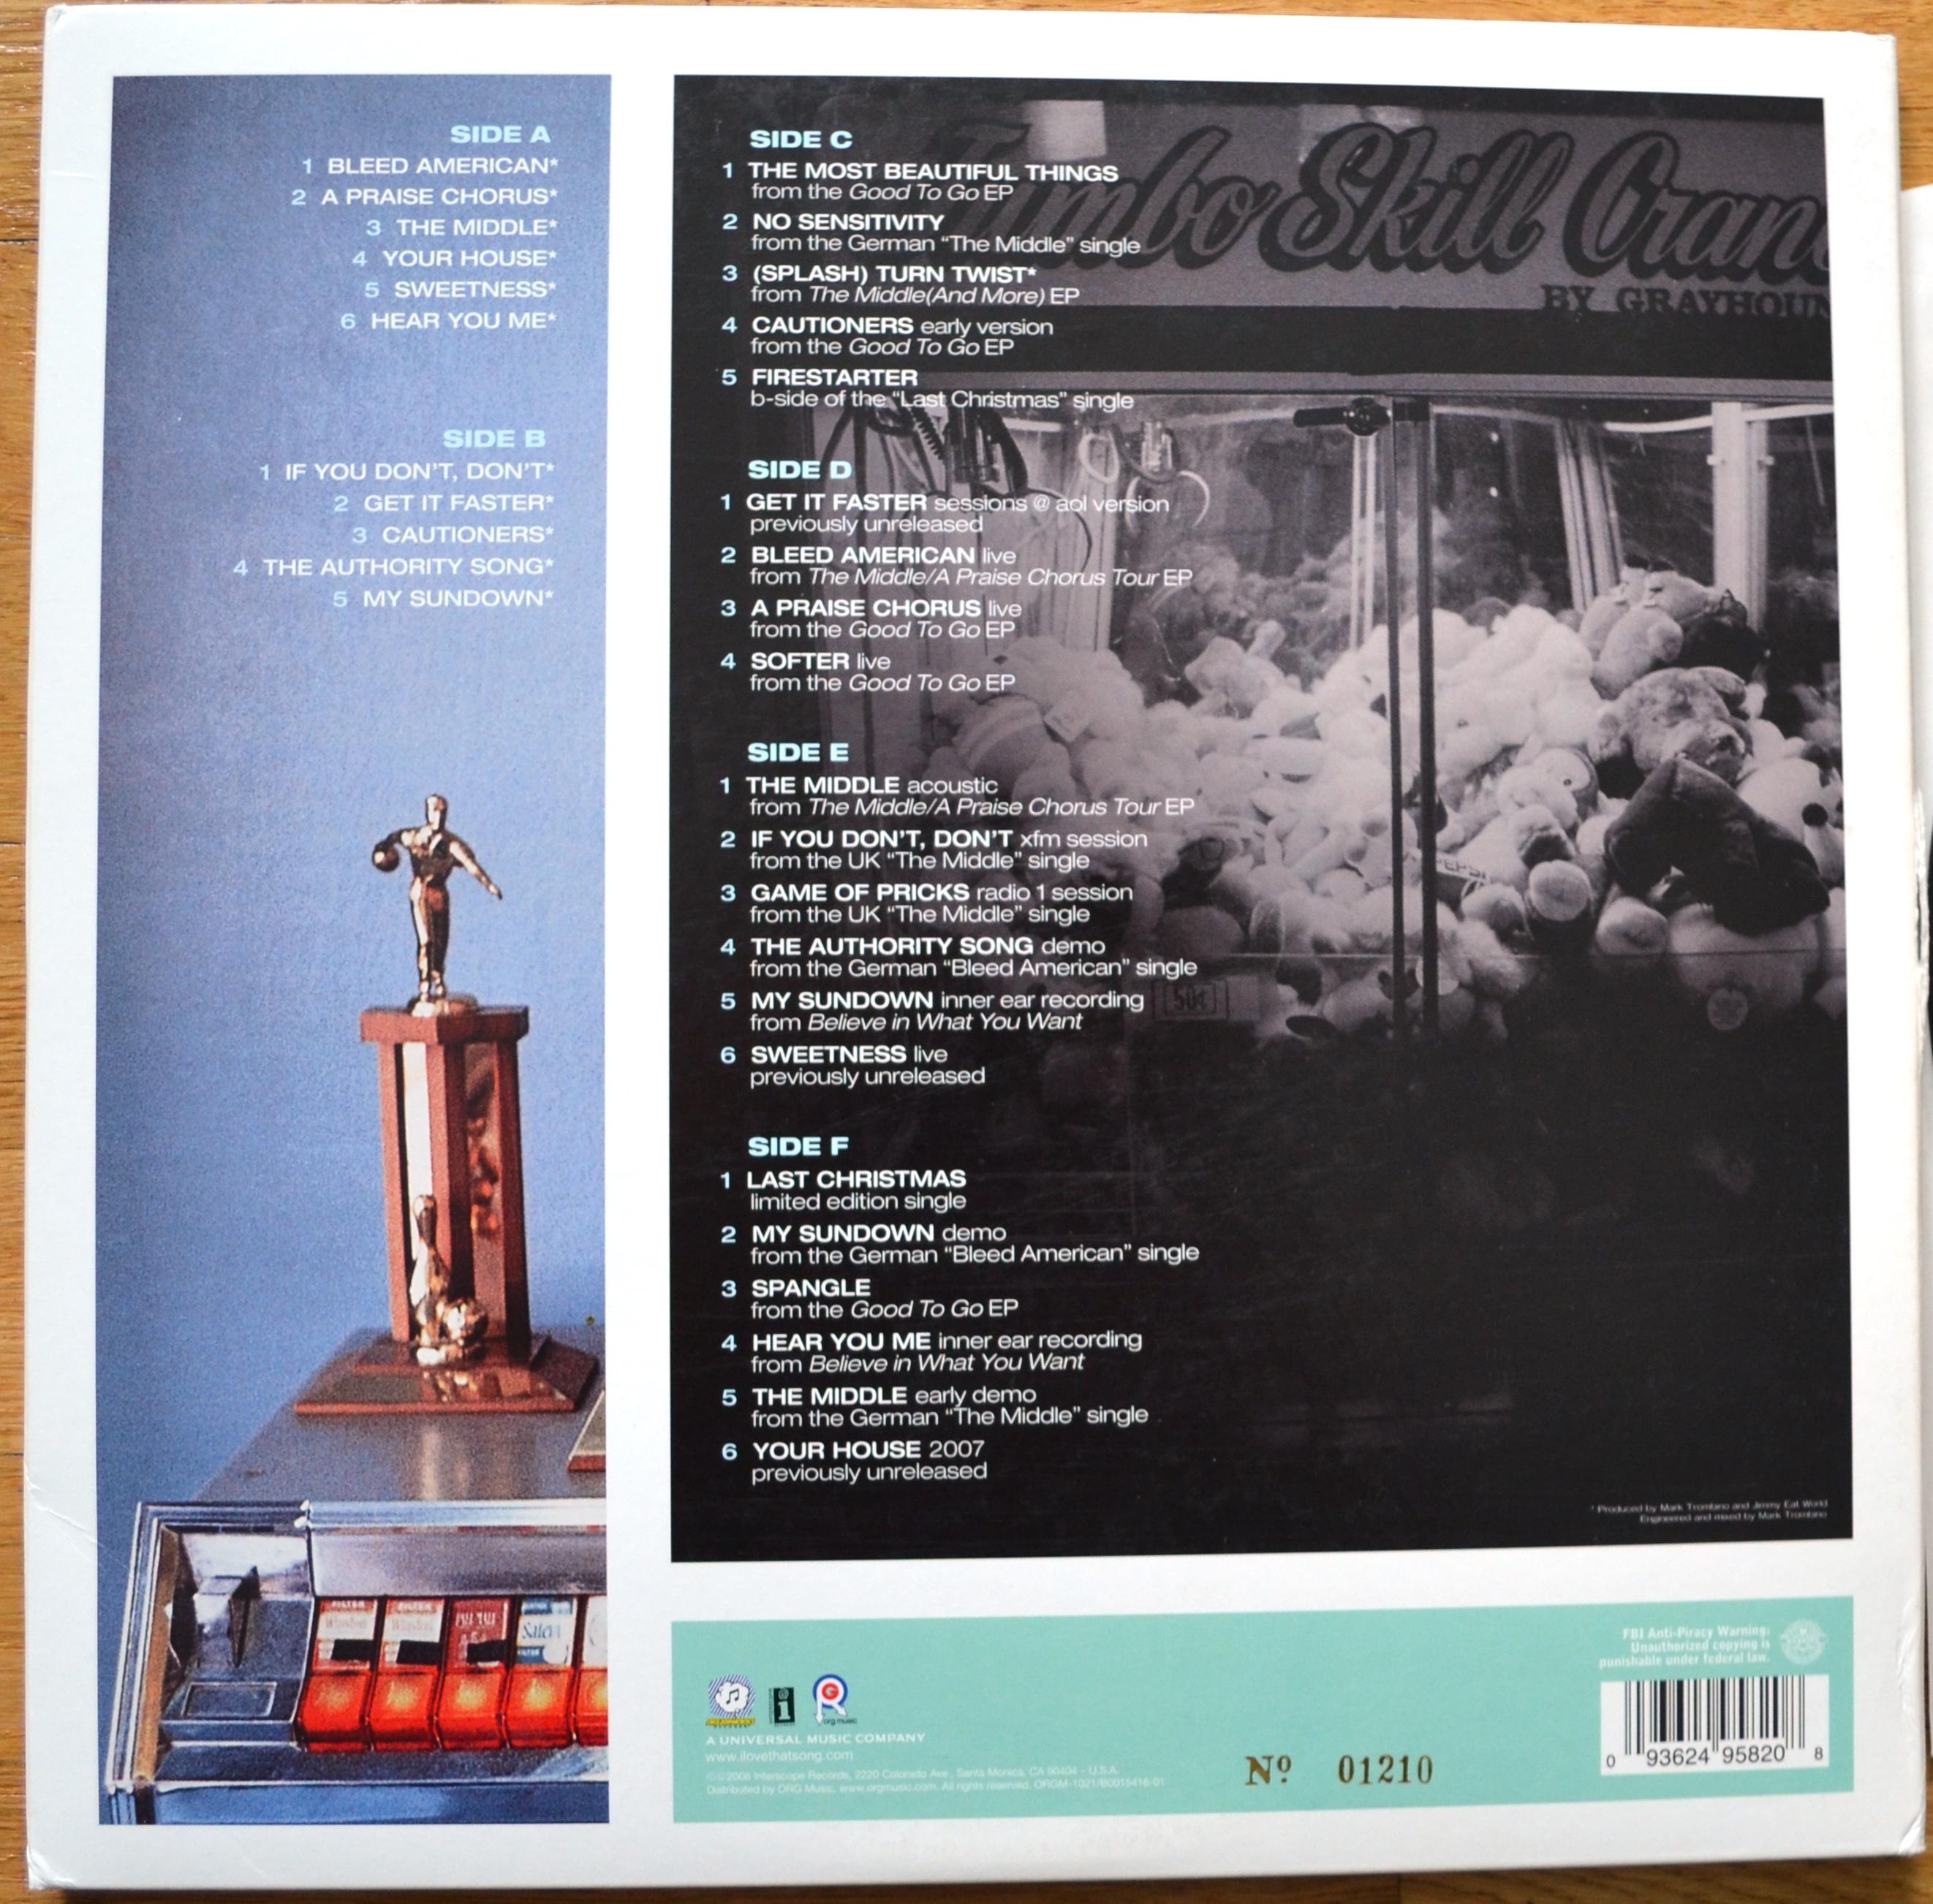 Jimmy Eat World - Bleed American 3xLP Vinyl · Revealed ...